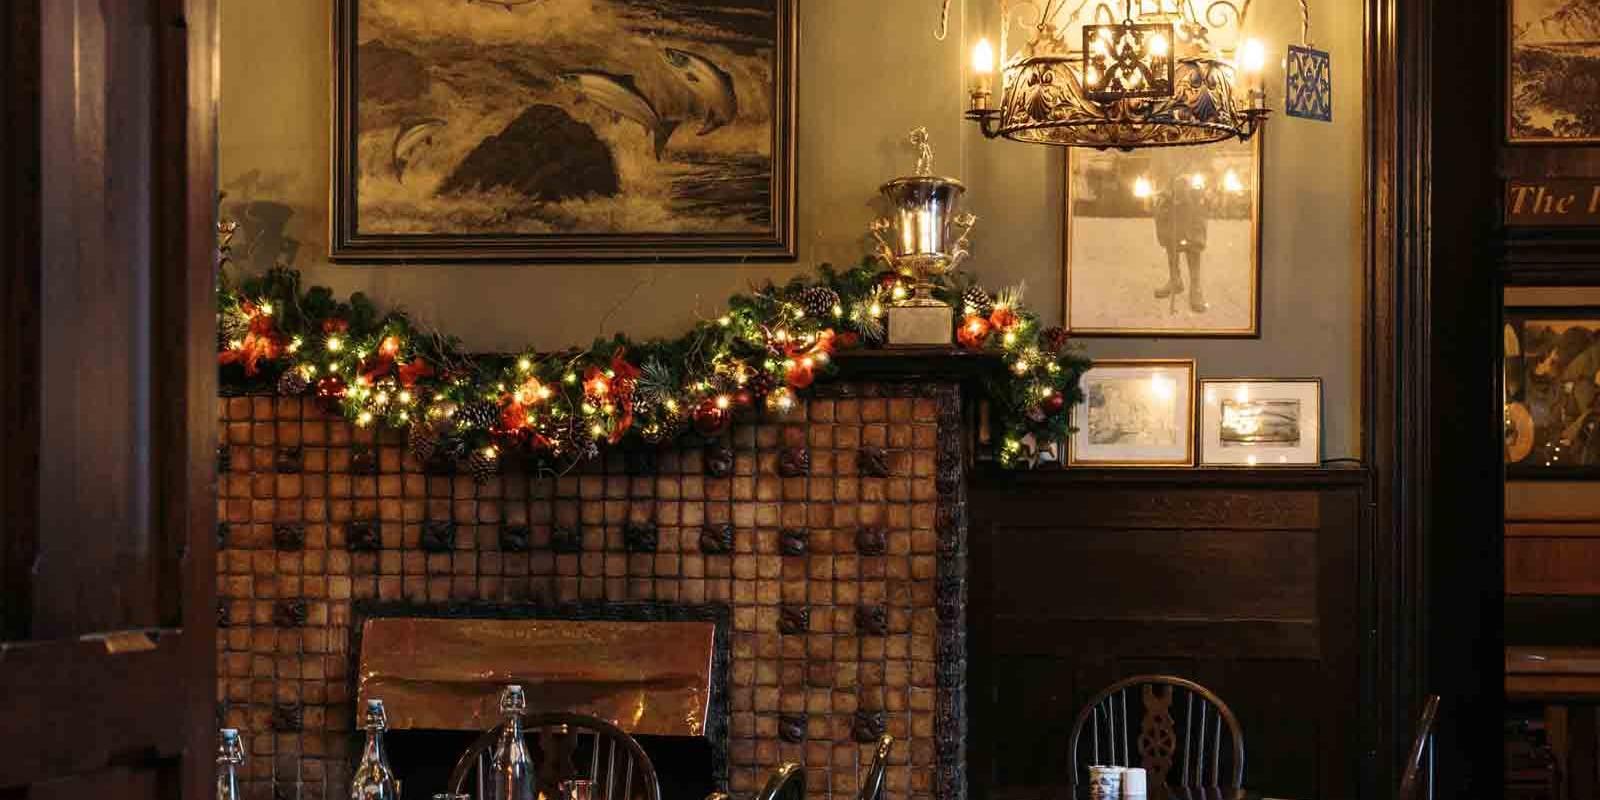 Fishermans Pub at Christmas